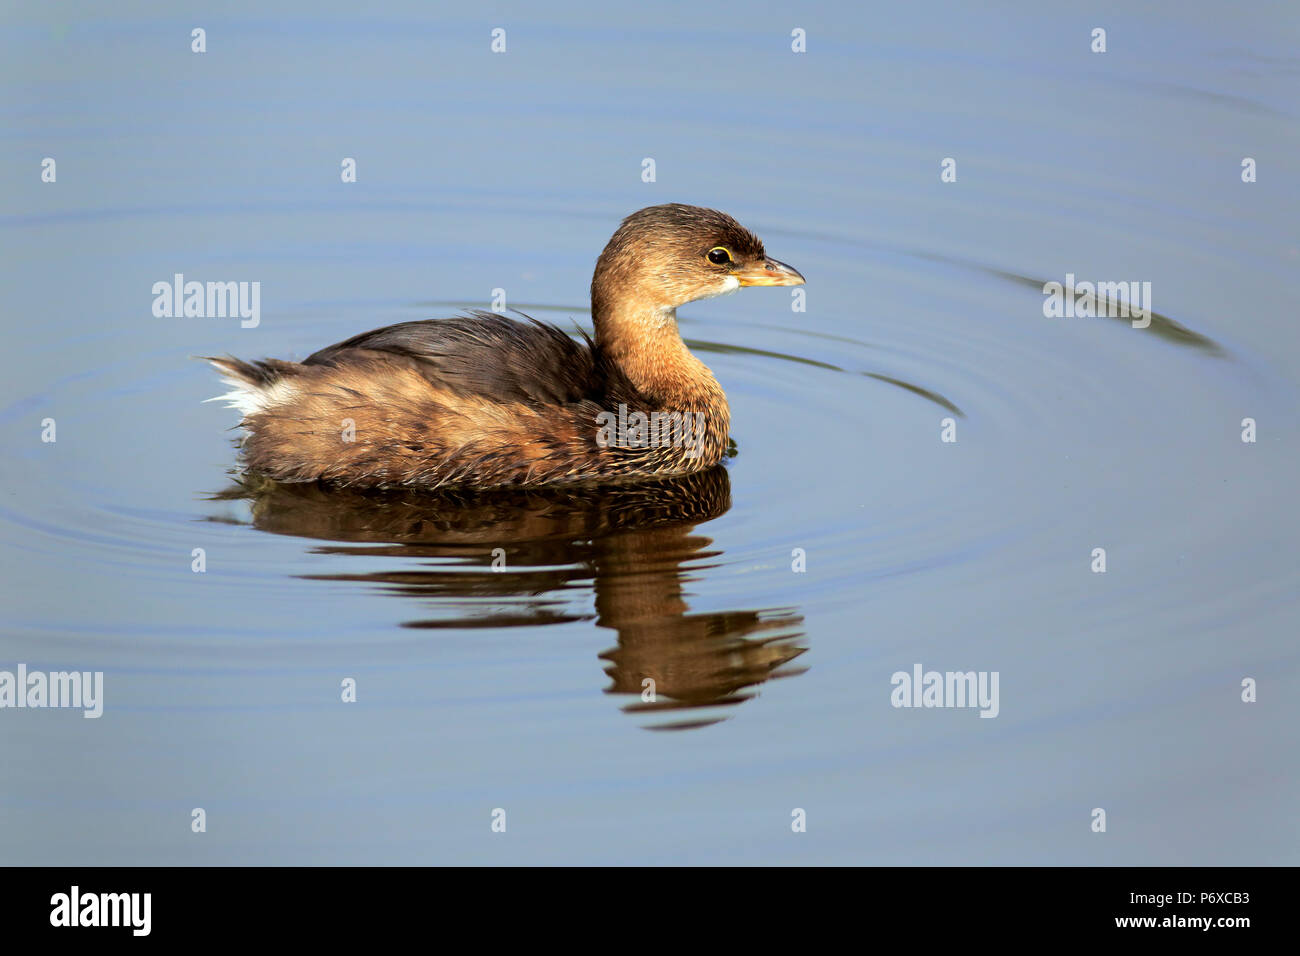 Pied-billed Grebe, adult swimming in water, Wakodahatchee Wetlands, Delray Beach, Florida, USA, Podilymbus podiceps - Stock Image